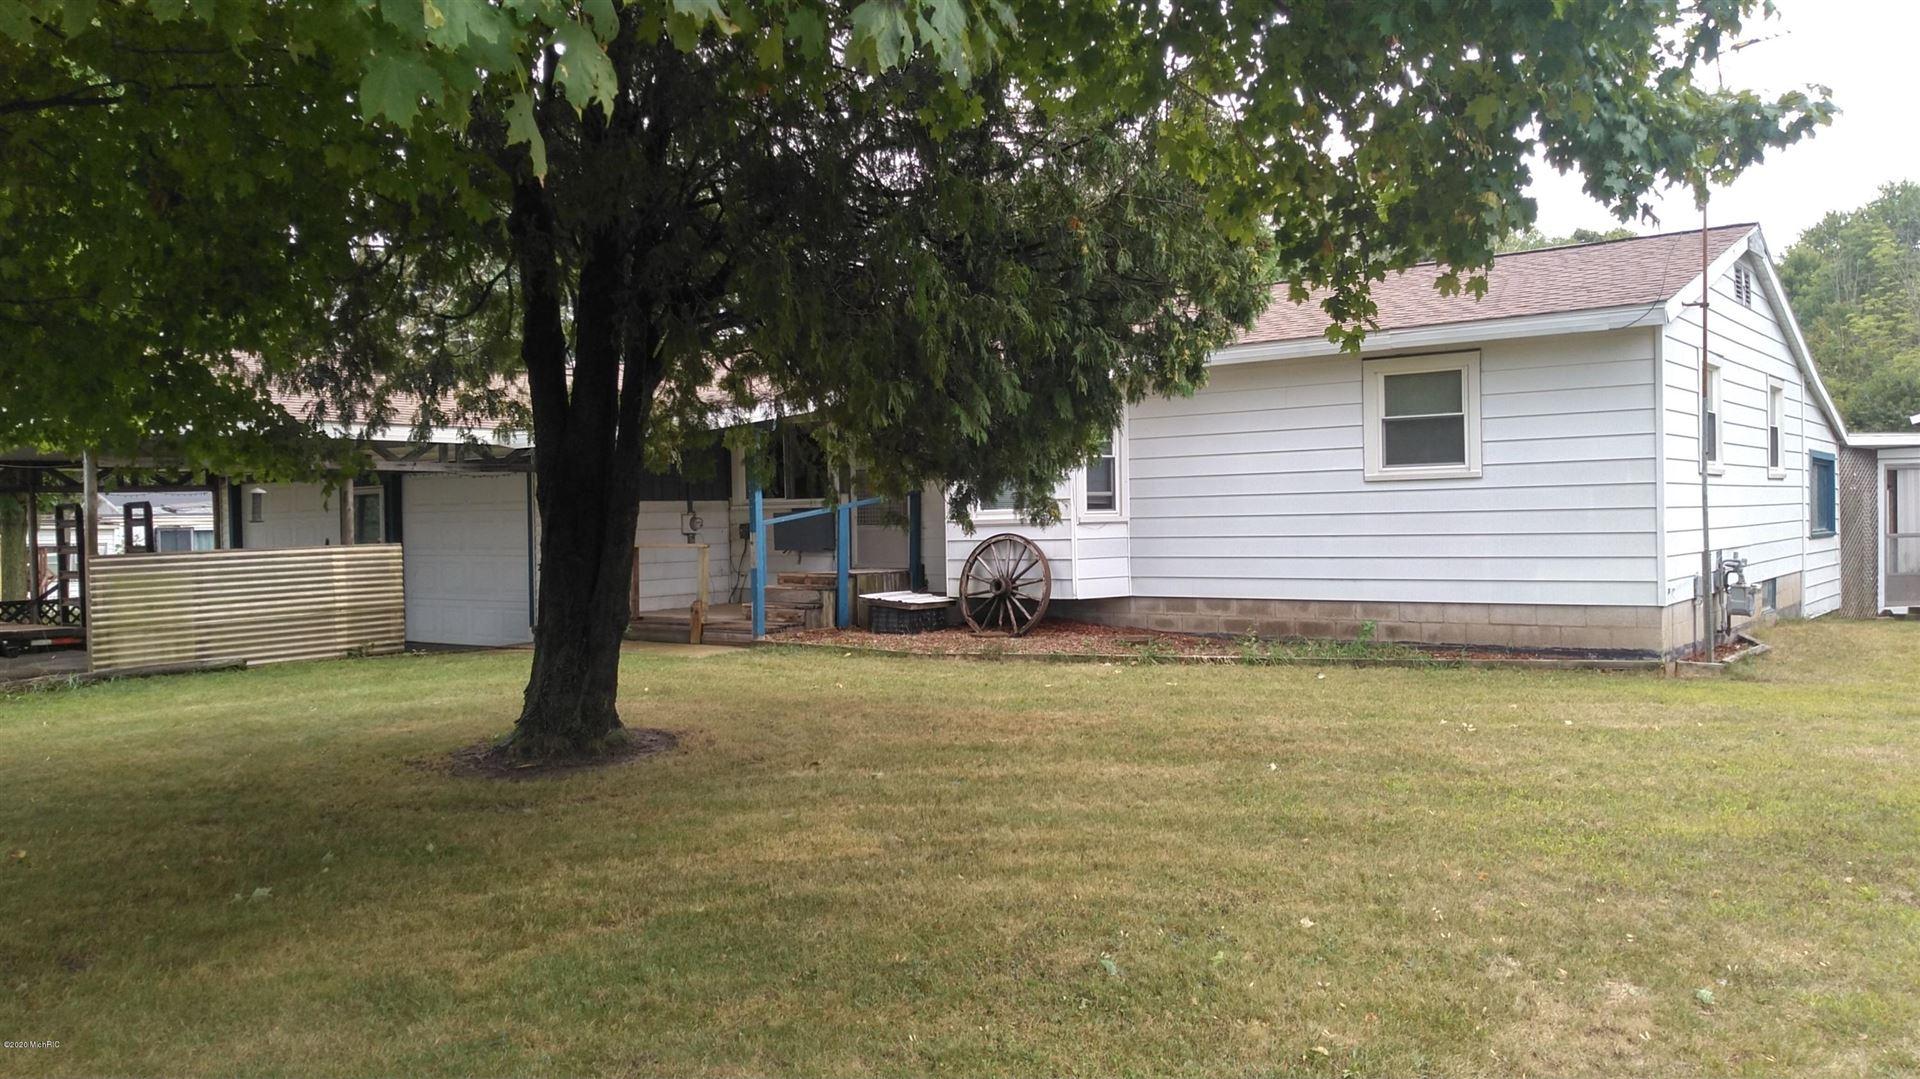 12676 Northland Drive, Cedar Springs, MI 49319 - MLS#: 20035735